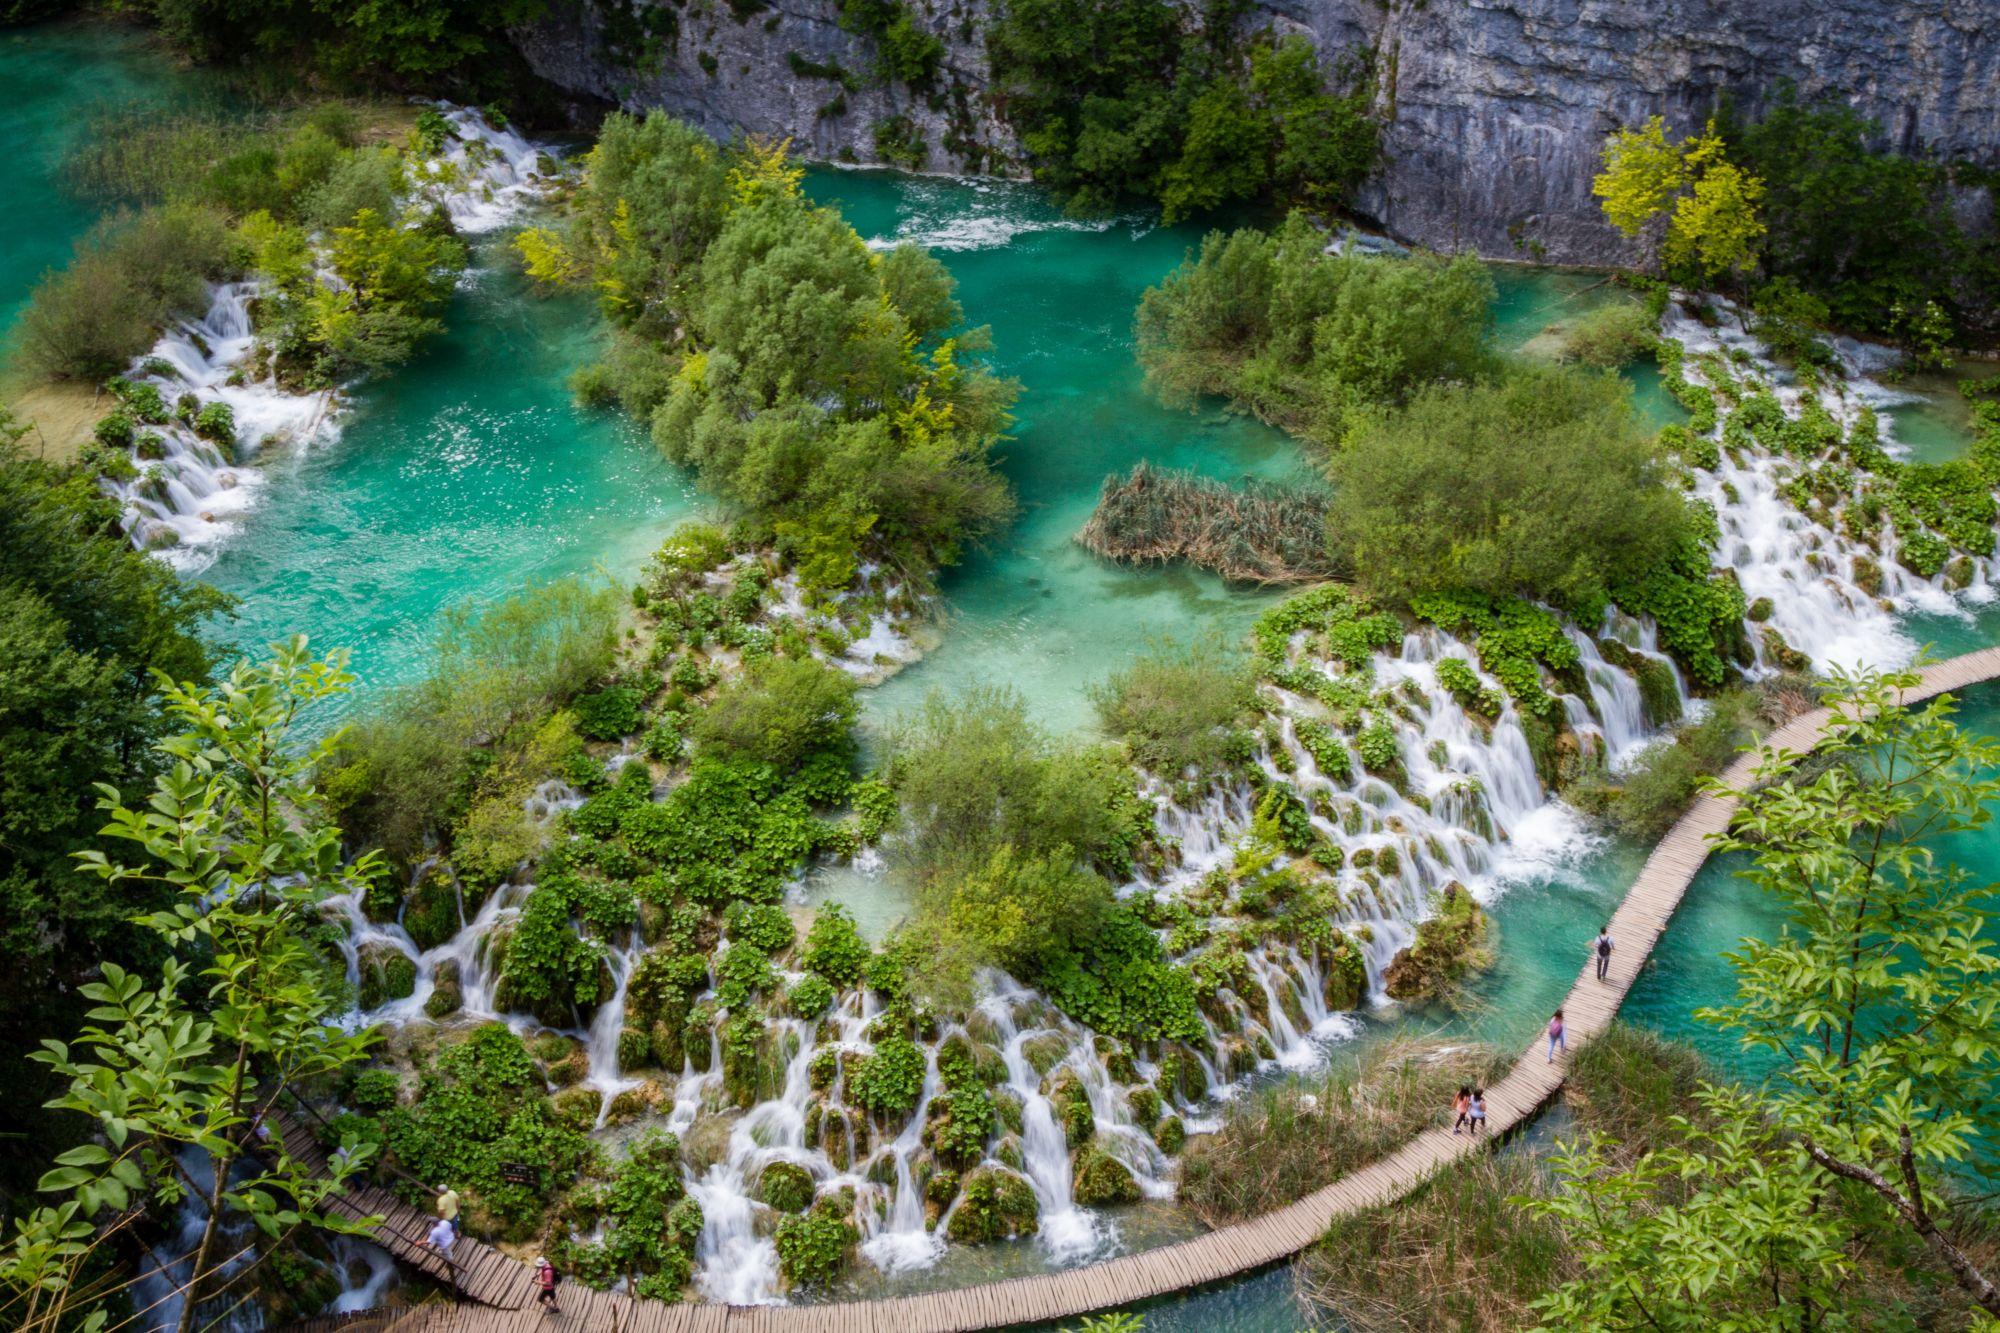 Ljepote sjeverne Dalmacije: Nacionalni park Plitvička jezera